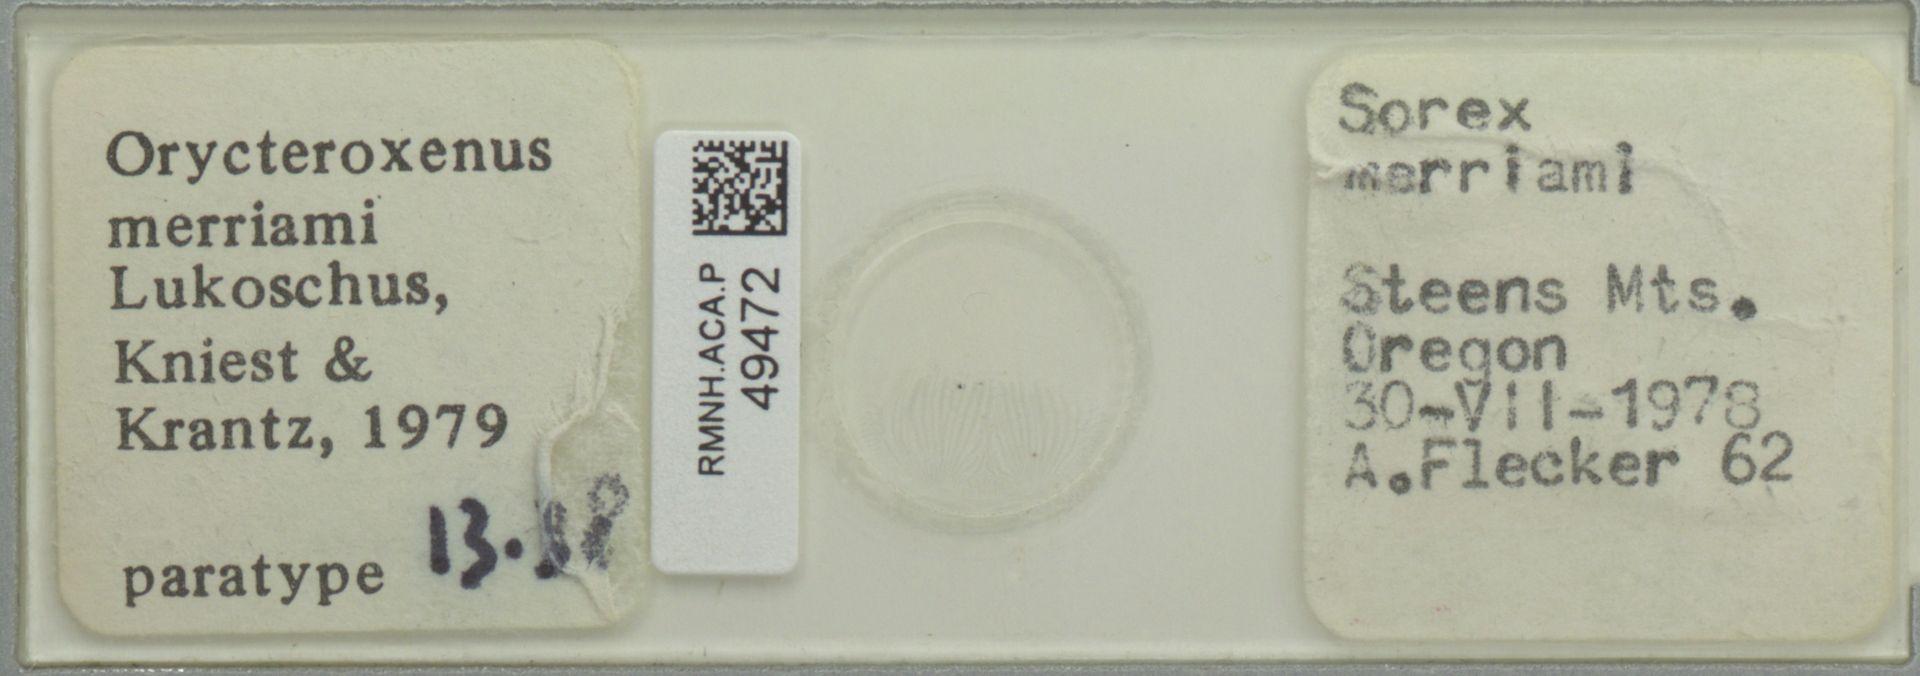 RMNH.ACA.P.49472 | Orycteroxenus merriami Lukoschus, Kniest & Krantz, 1979